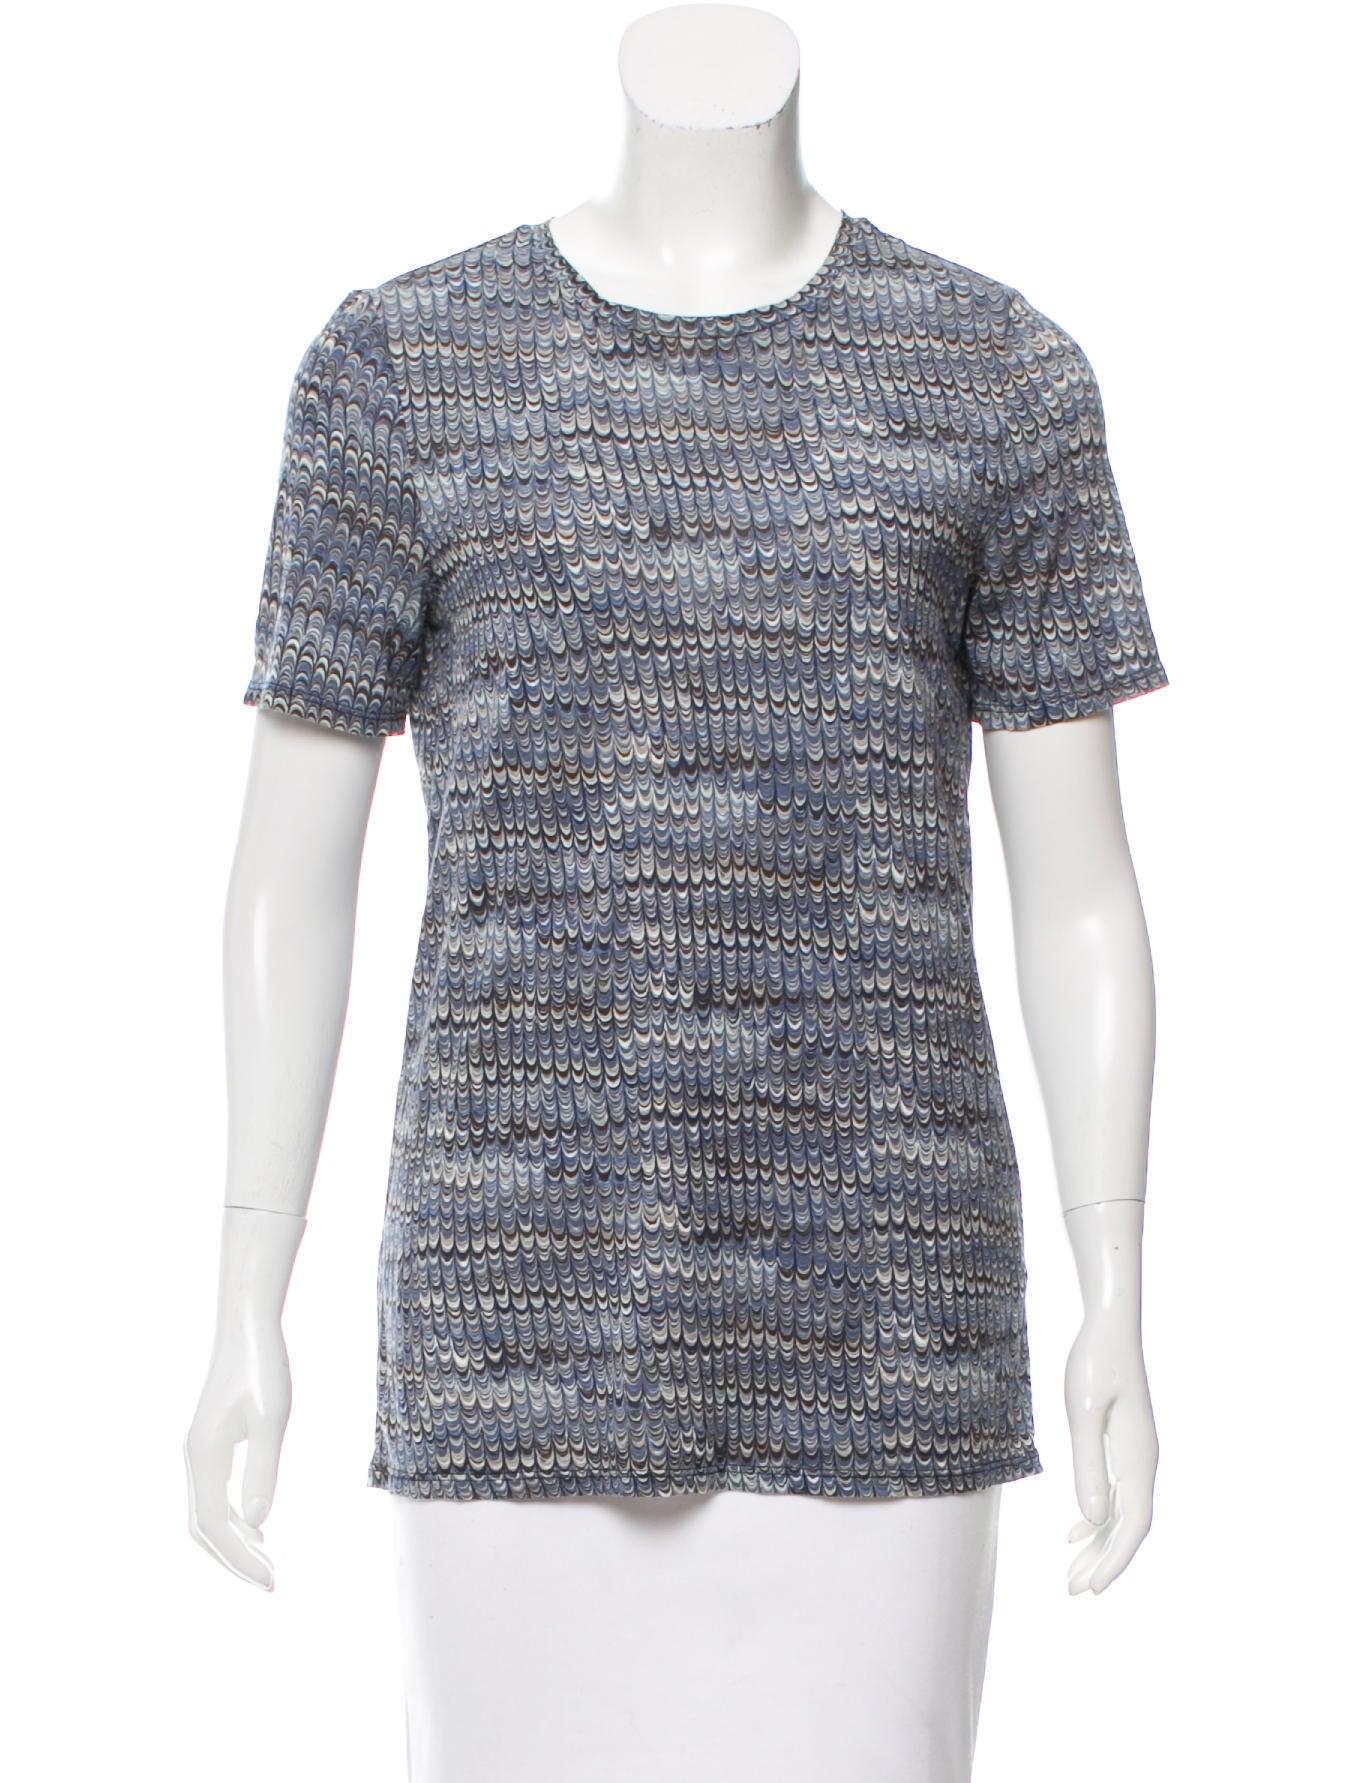 Tory burch short sleeve abstract print t shirt clothing for Tory burch t shirt